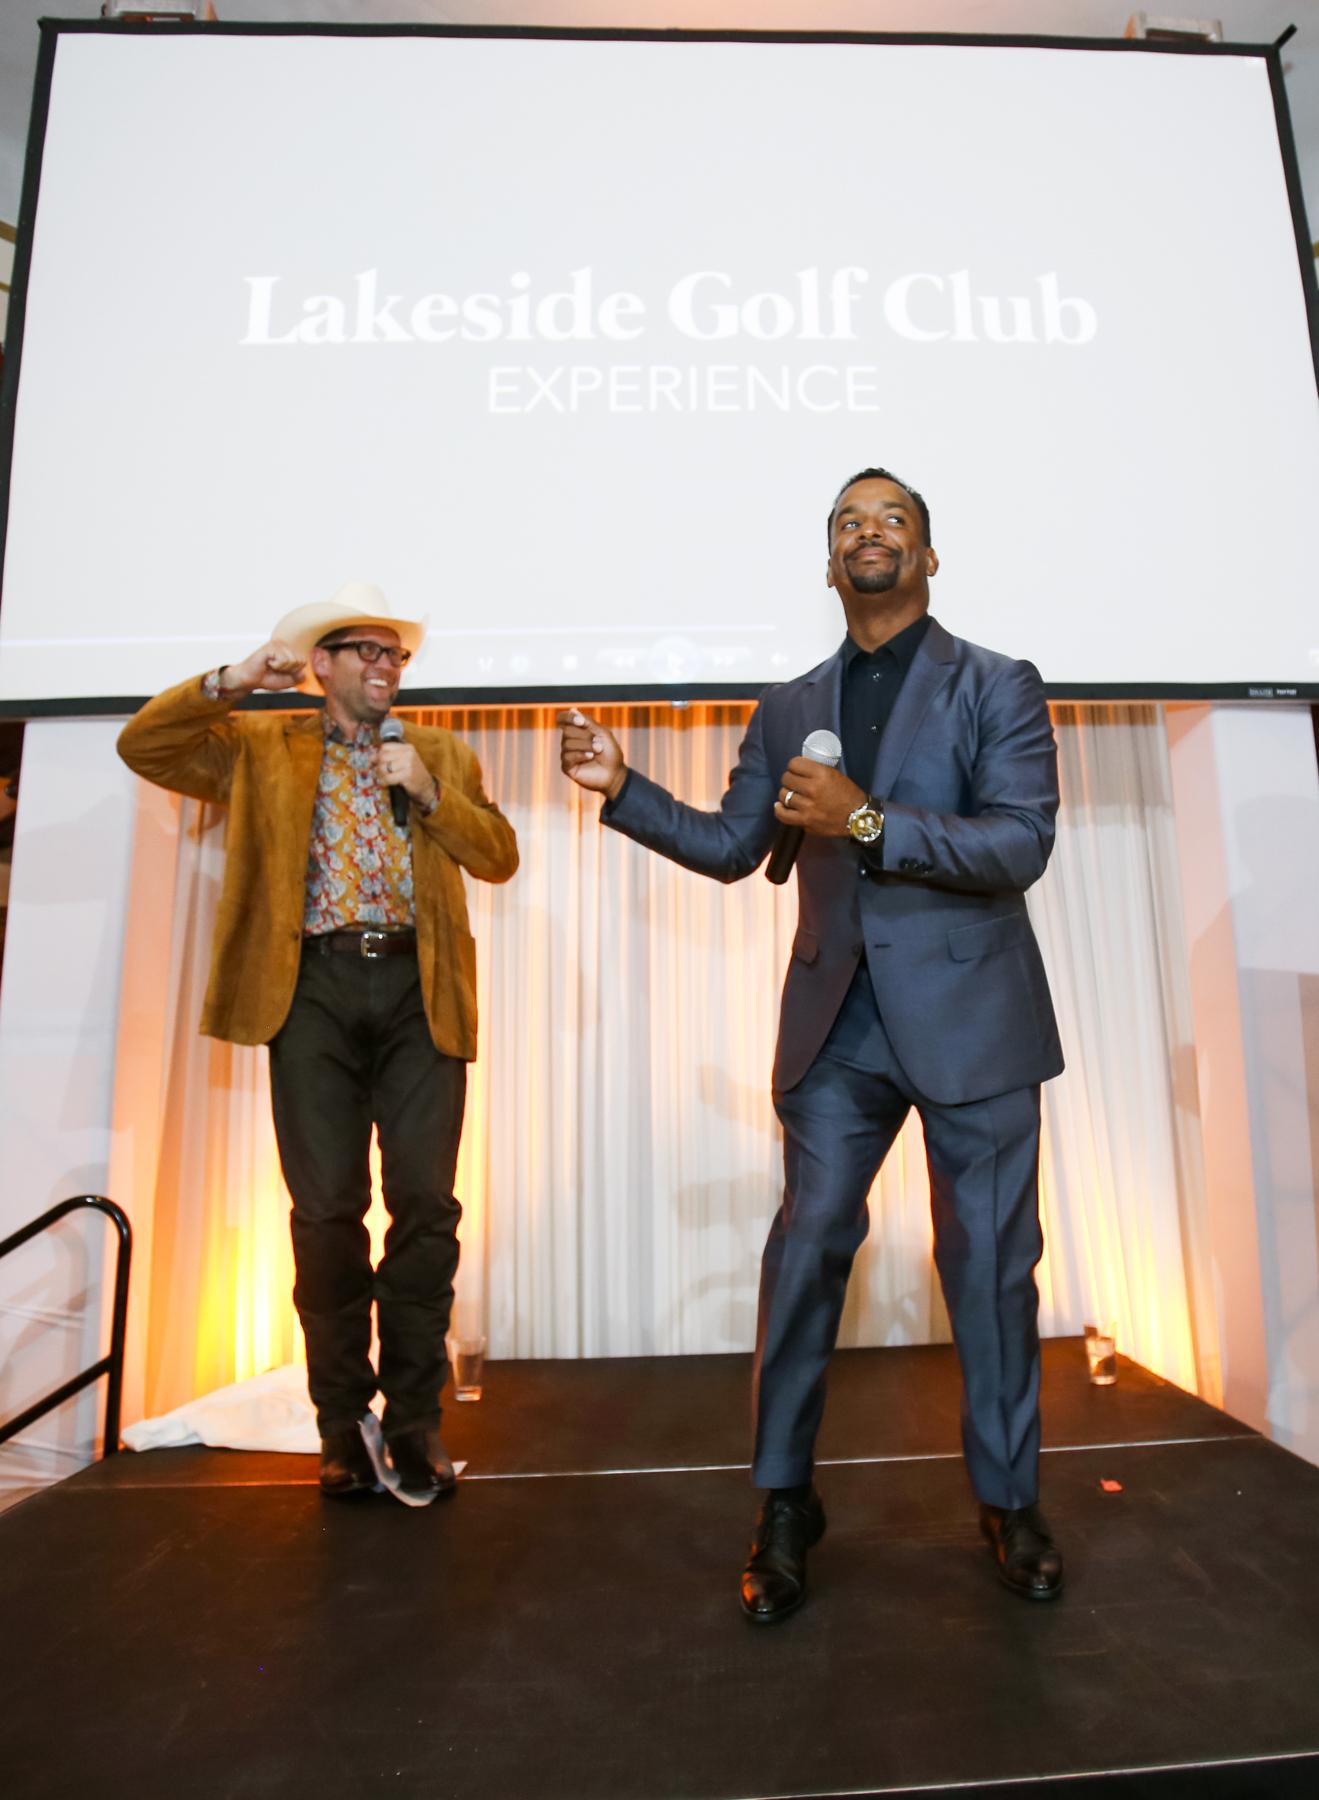 golf-give-gala-celebrity-michael-phelps-jason-day-event-photographer-madison-wi-51.jpg